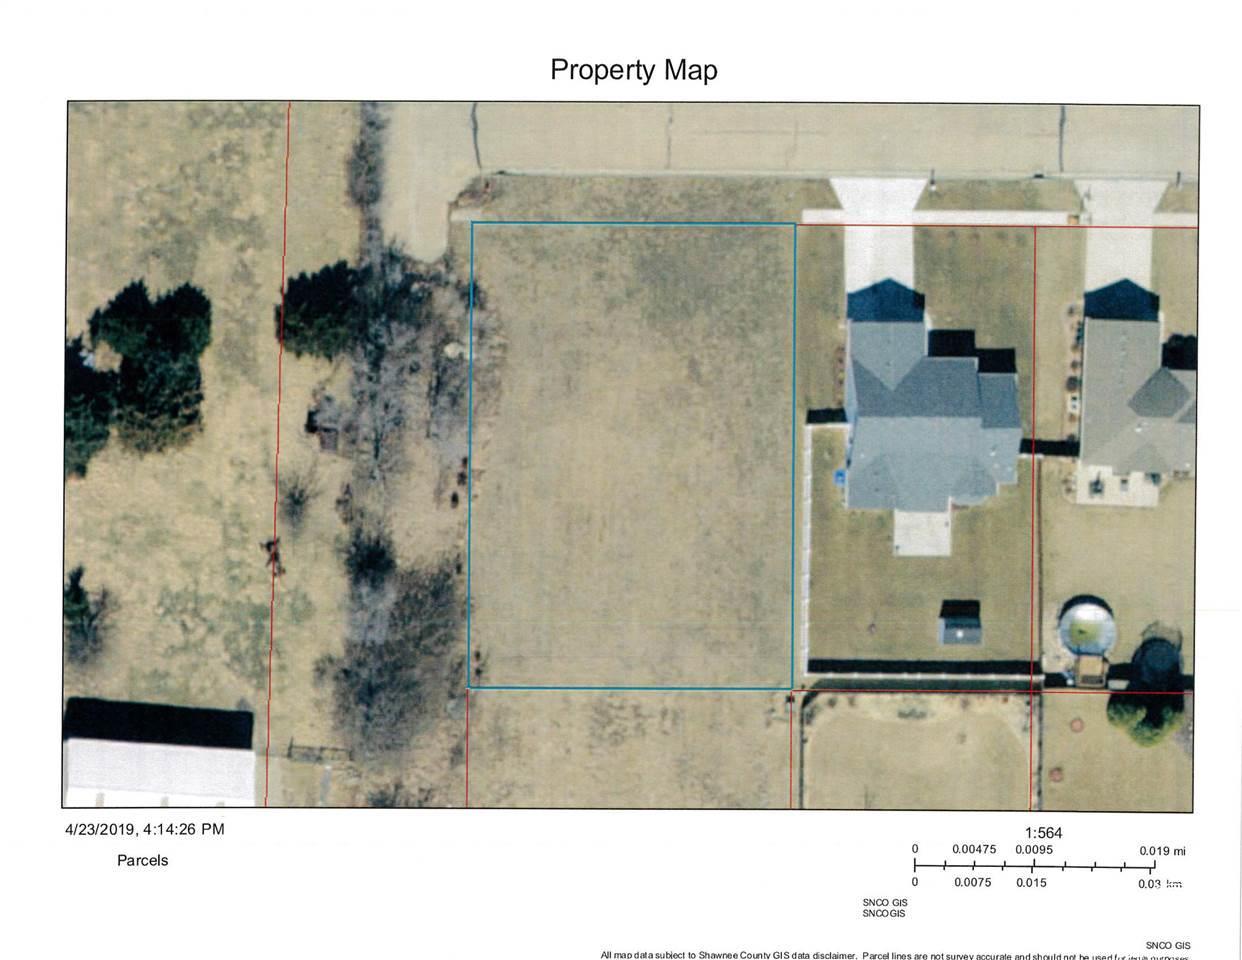 Photo of Lot 1 Block F 43rd Place Topeka KS 66609